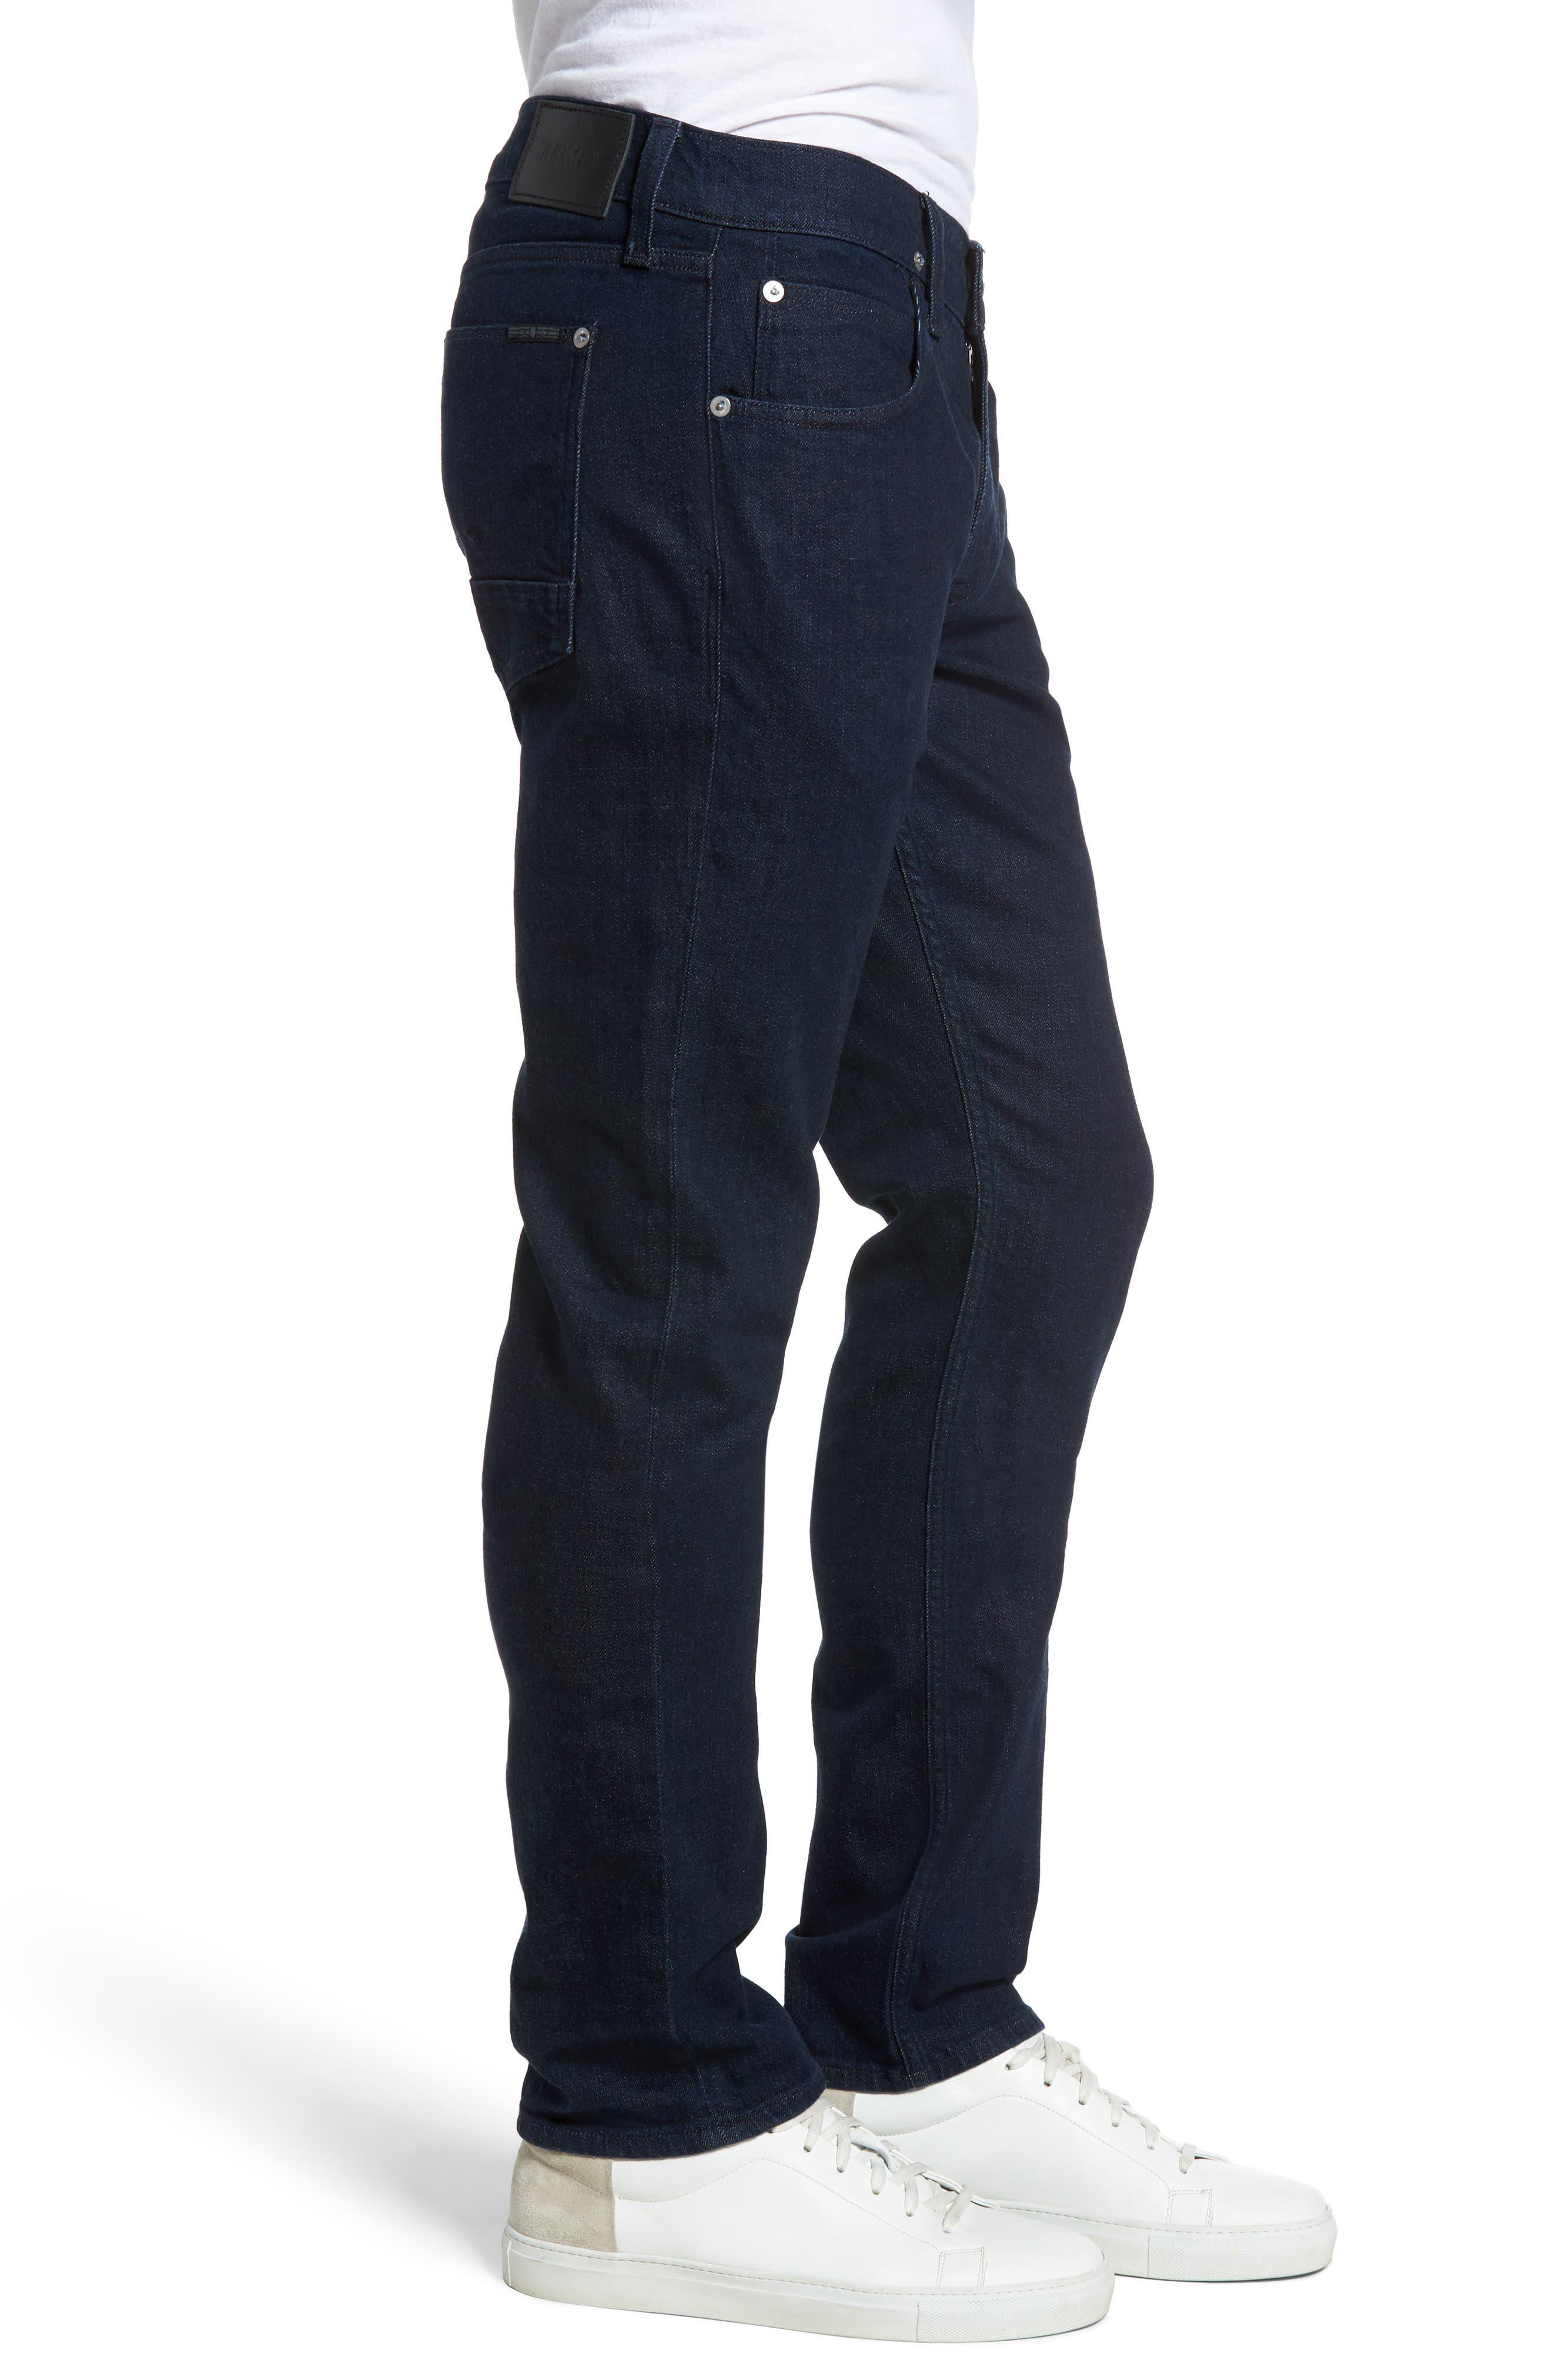 Blake Slim Fit Jeans,                             Alternate thumbnail 3, color,                             Firebrand